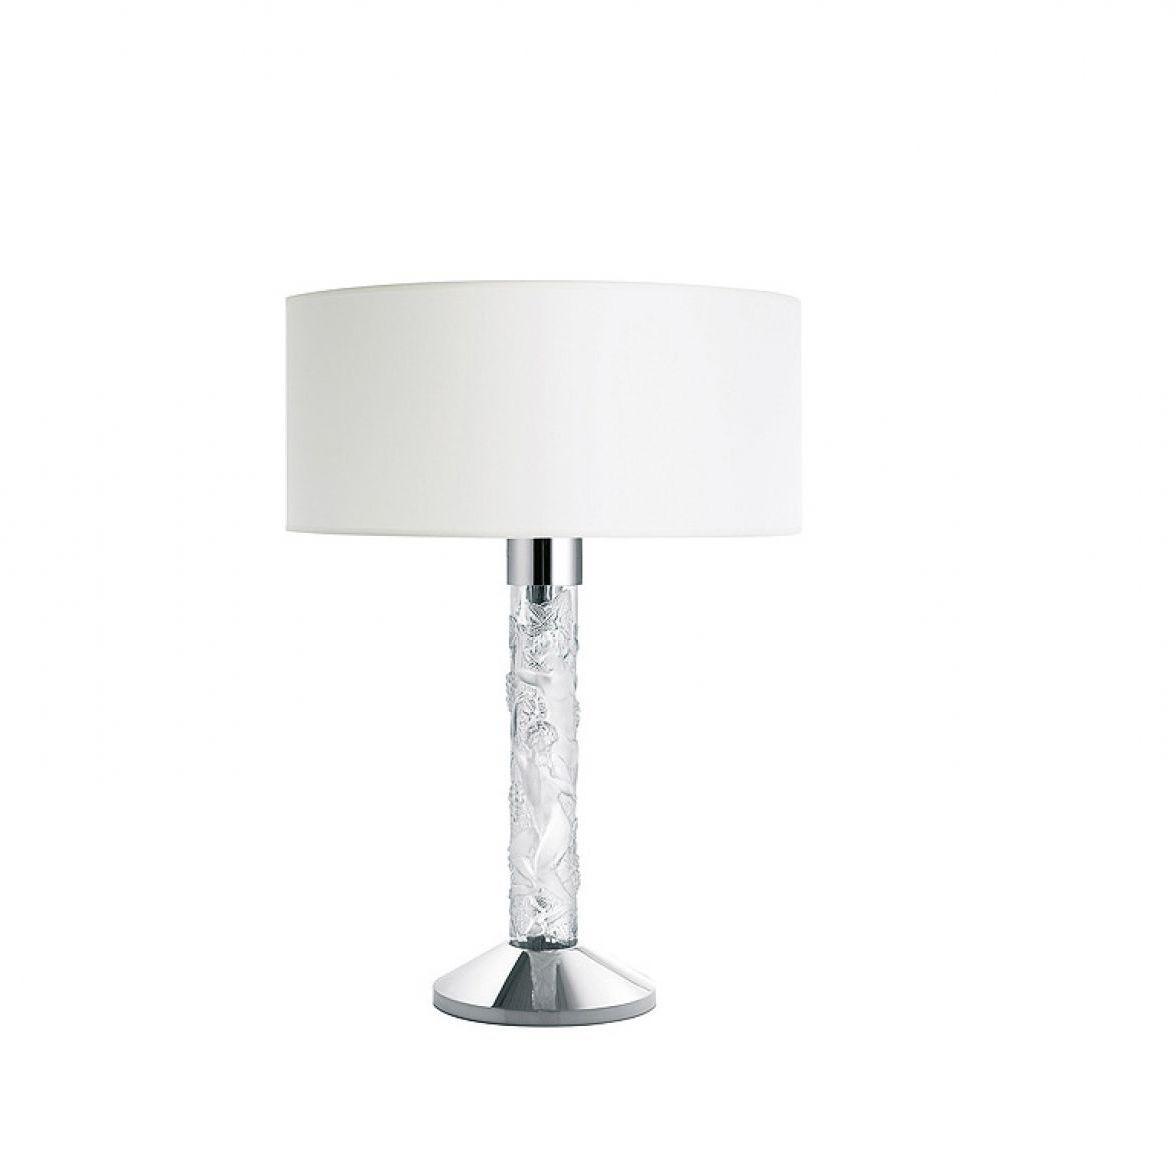 Faunes lamp